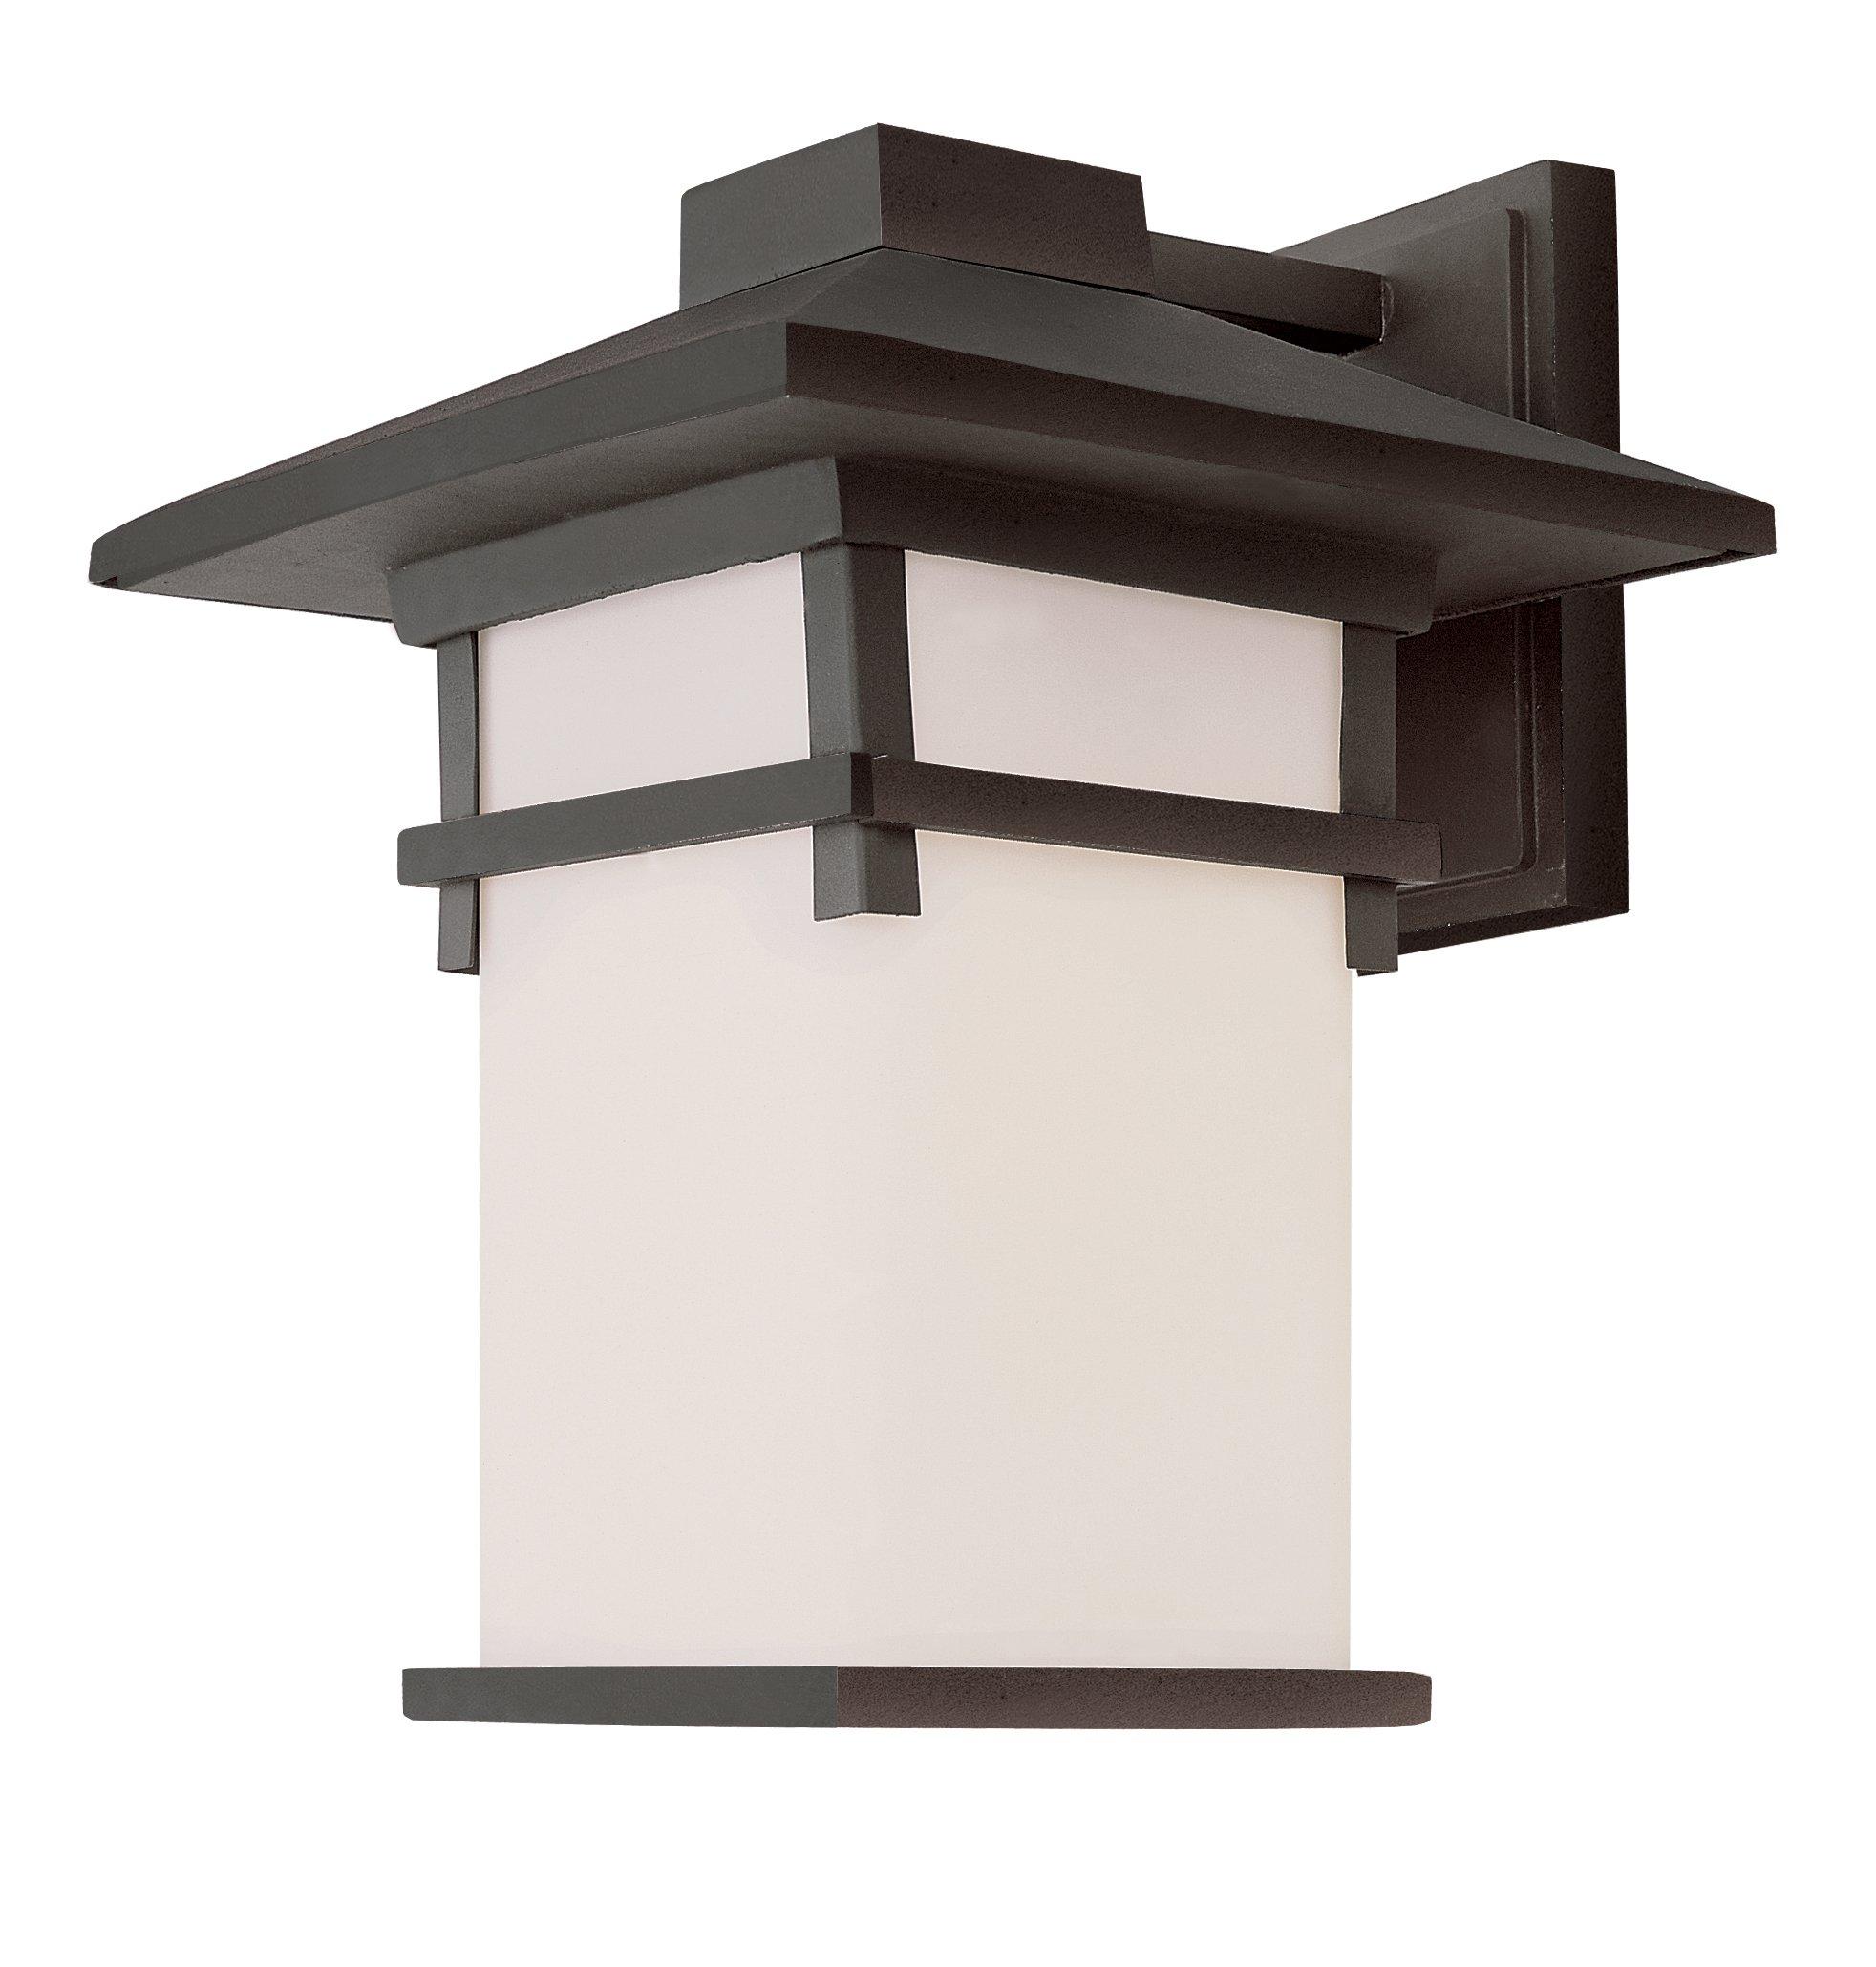 Trans Globe Lighting 40022 BK 13-Inch Mission Wall Lantern, Black